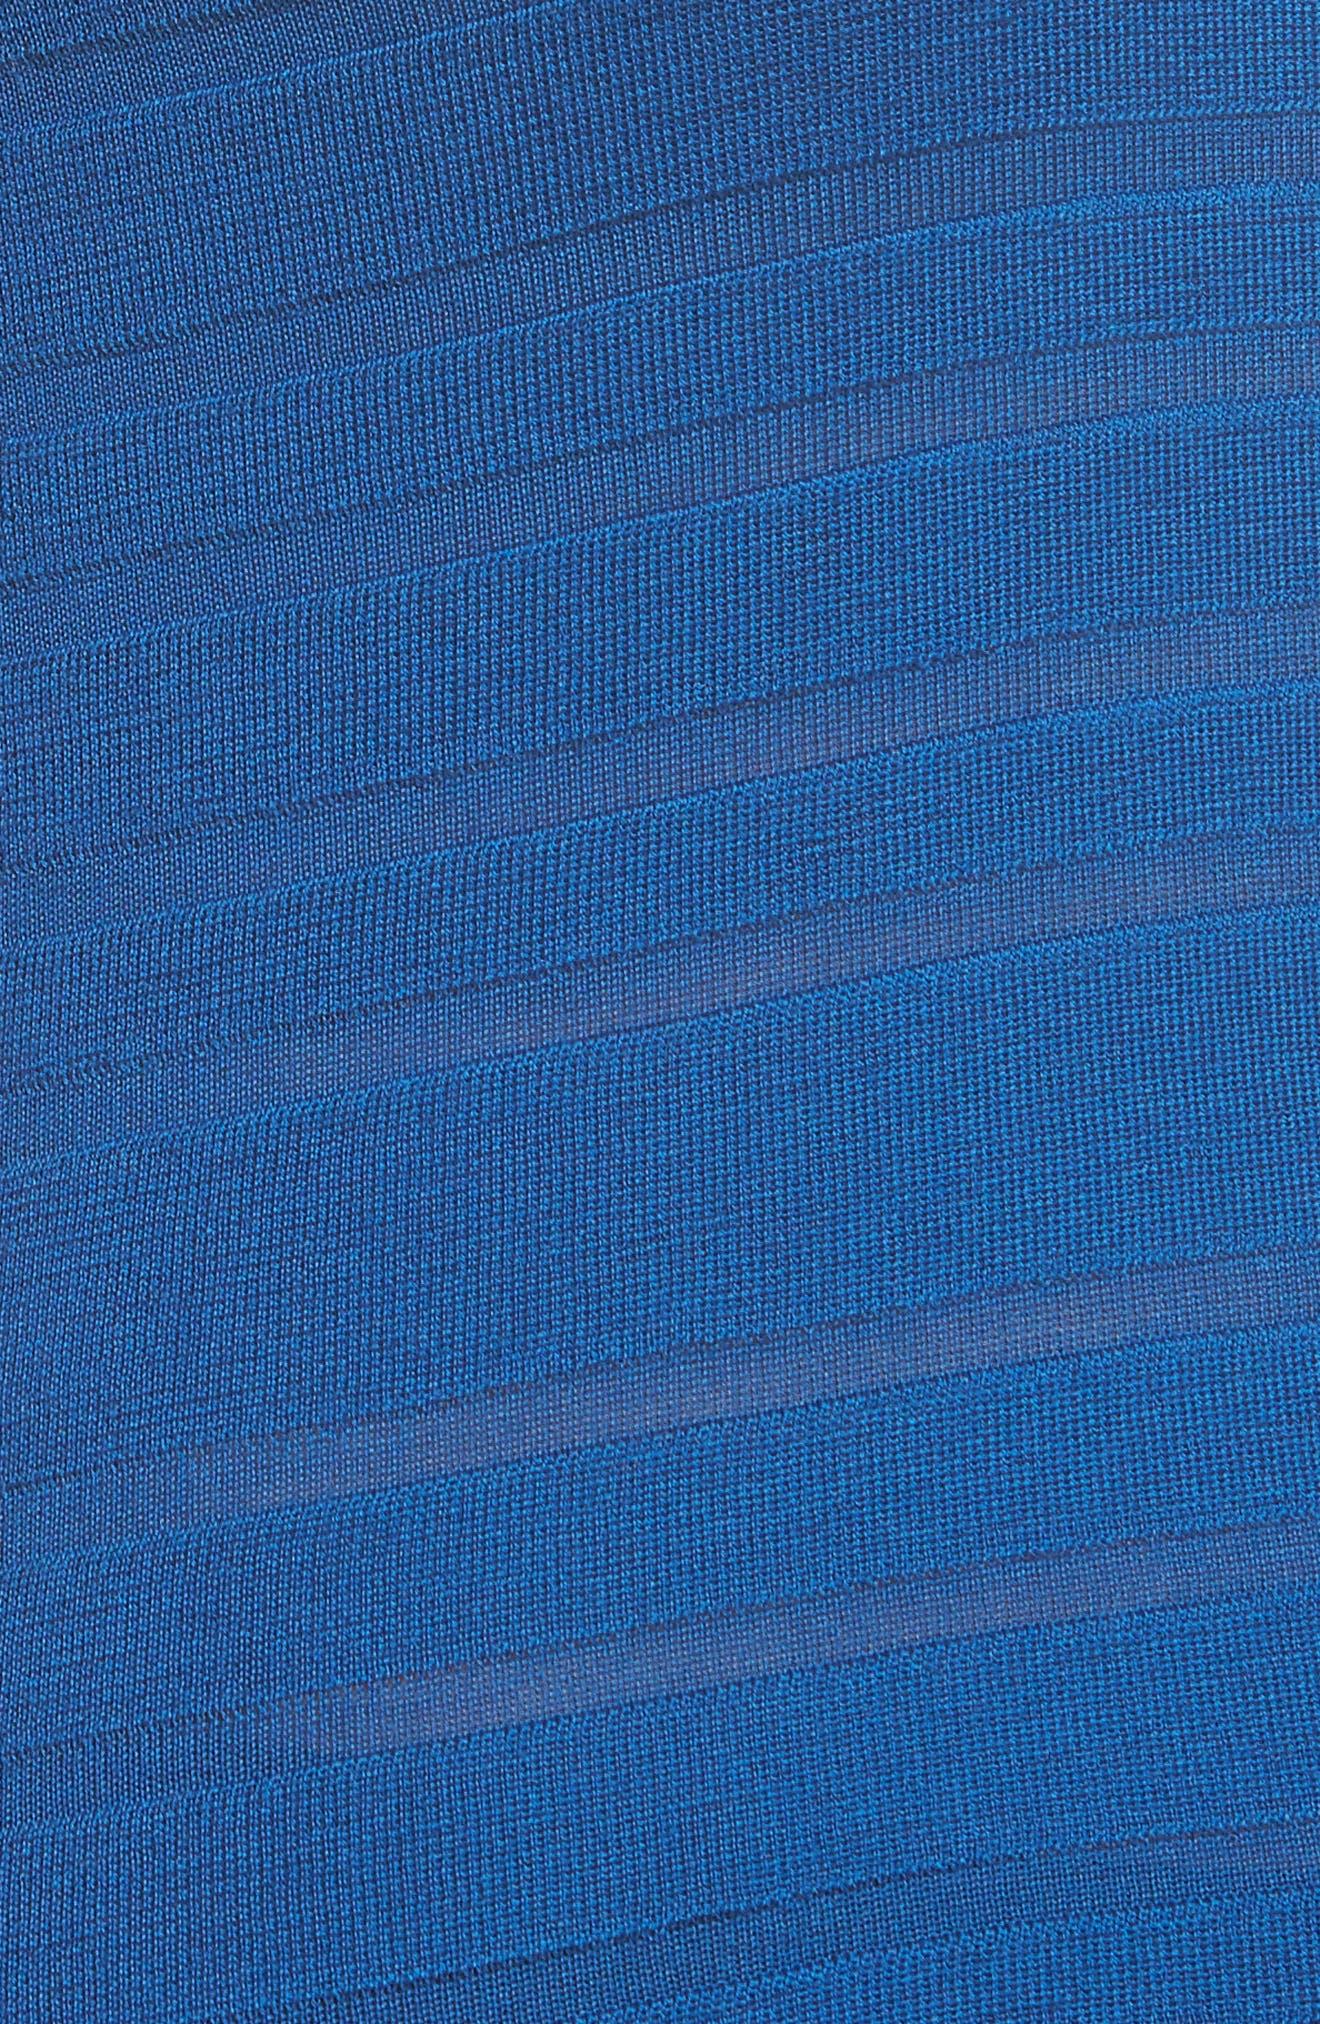 Finea Stripe Textured Wool Sweater,                             Alternate thumbnail 10, color,